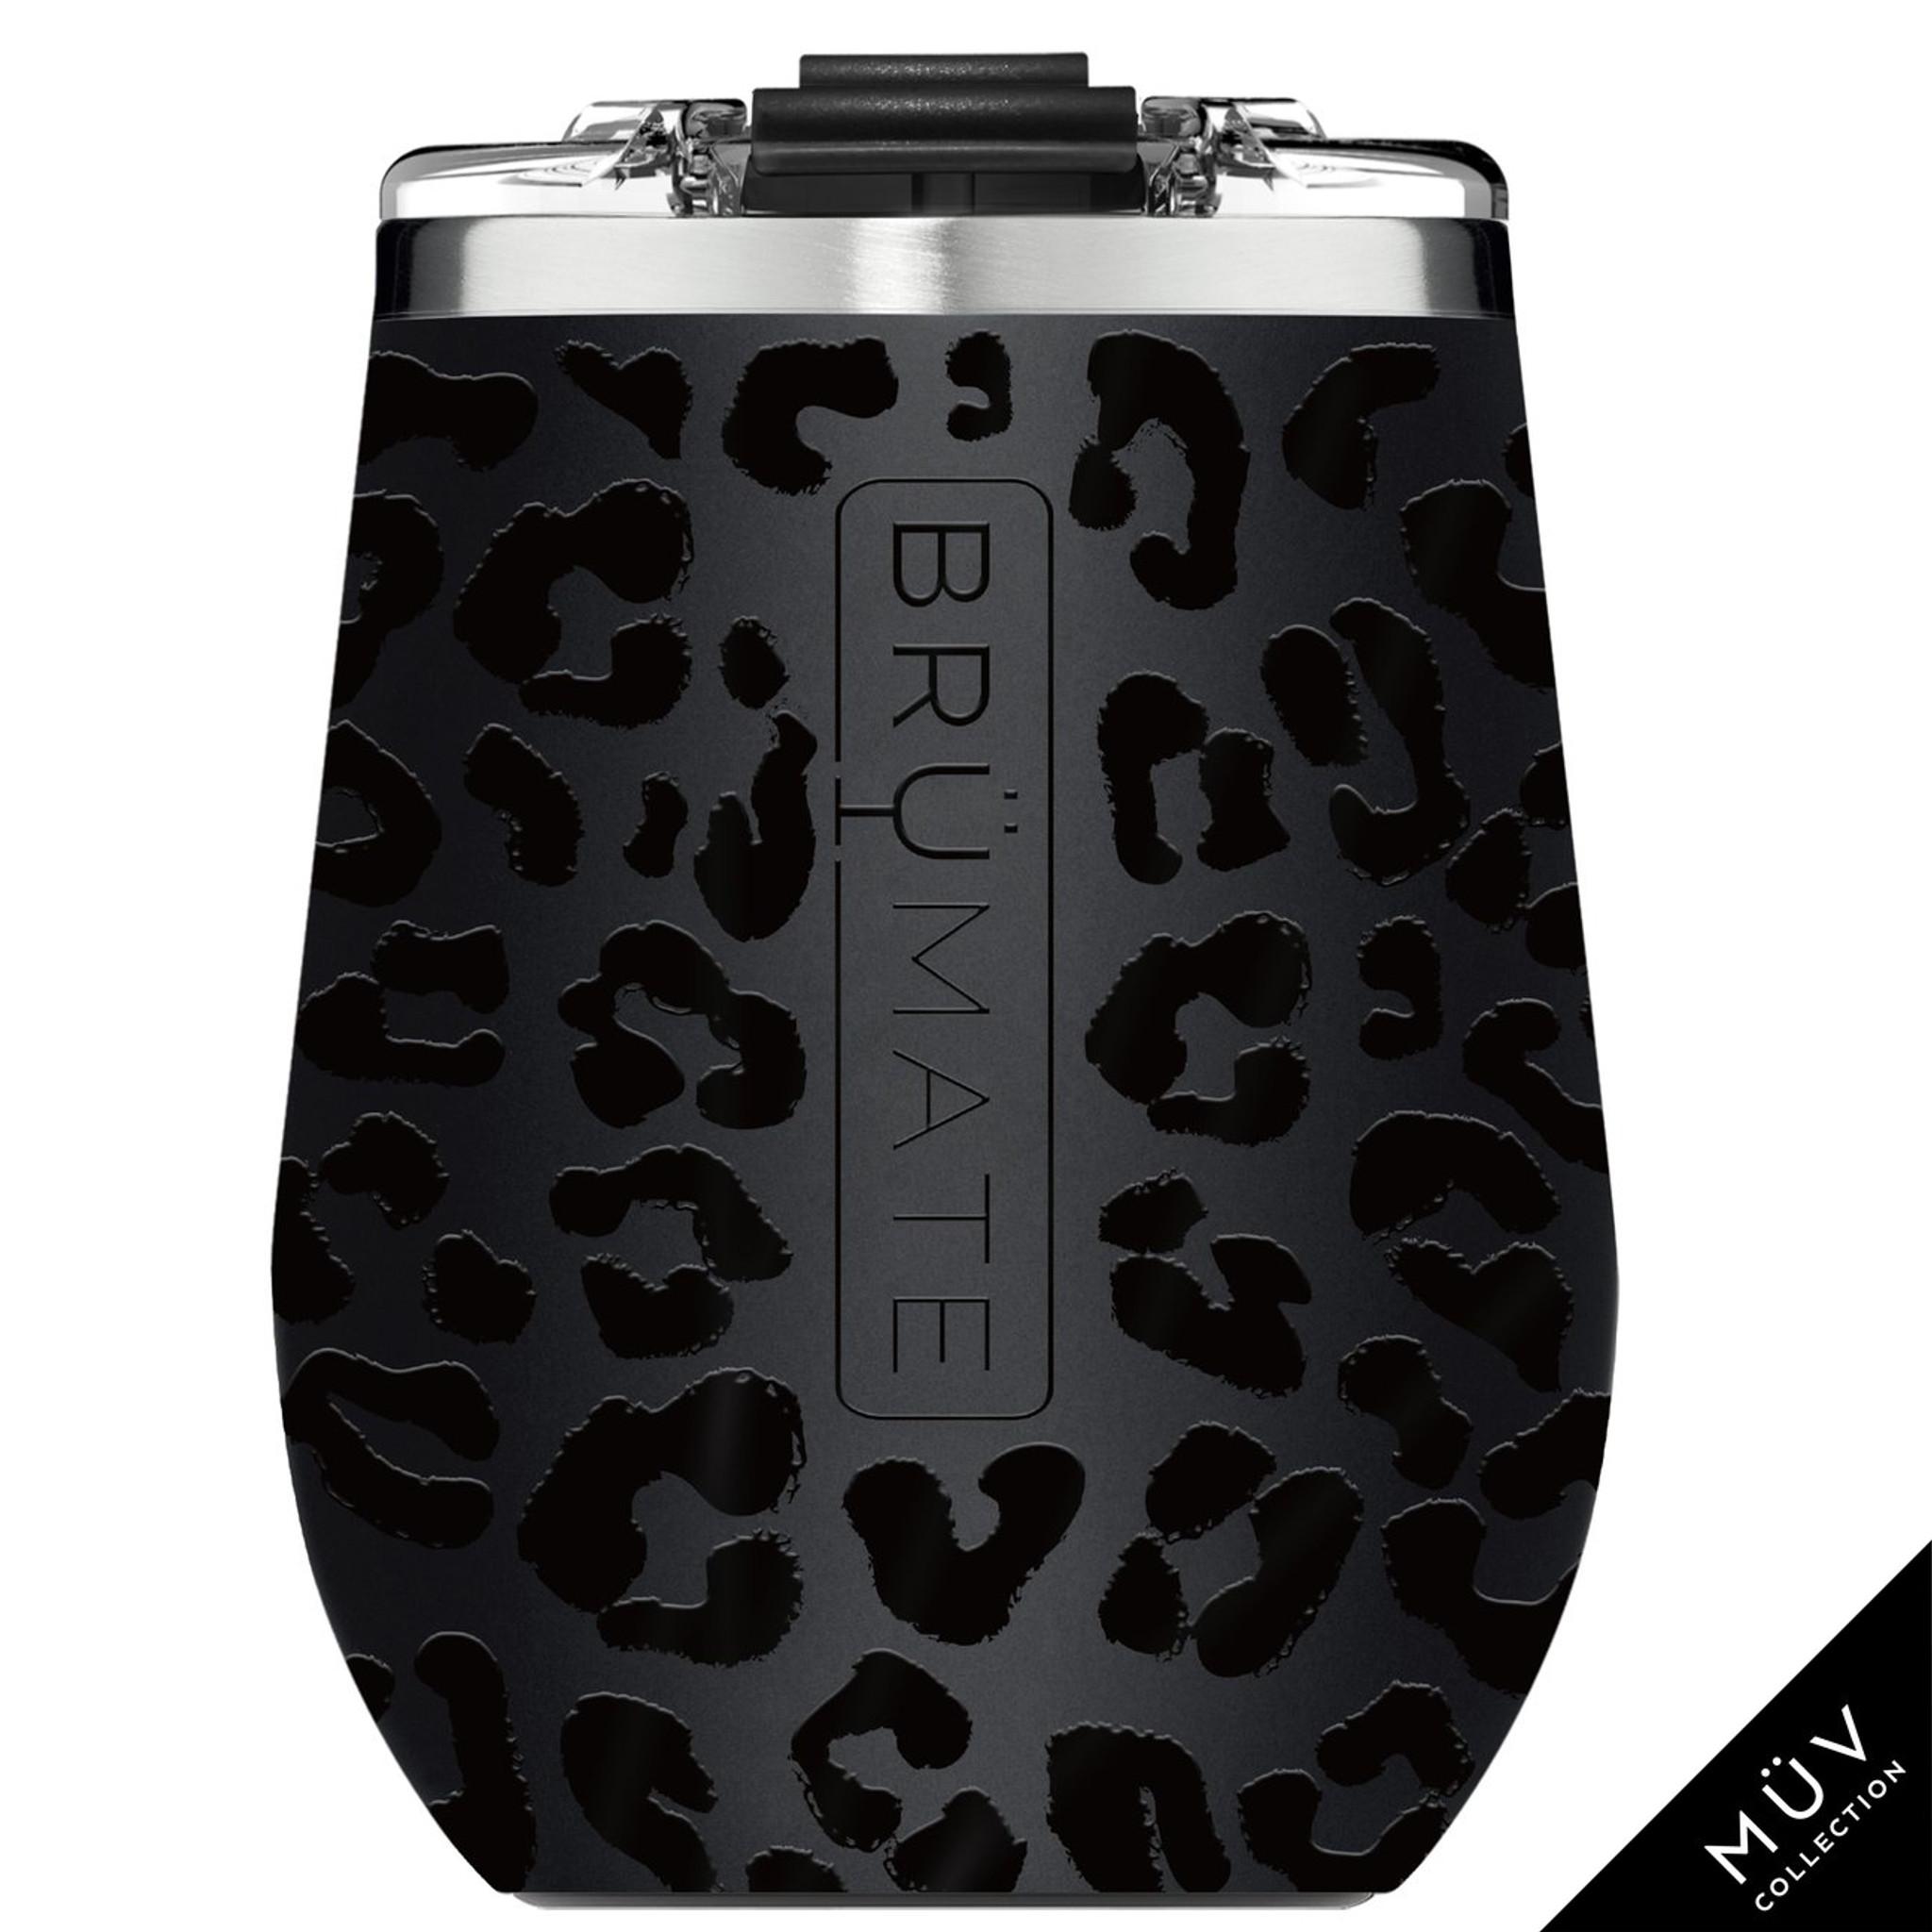 Brumate MUV Wine Tumbler - Onyx Leopard